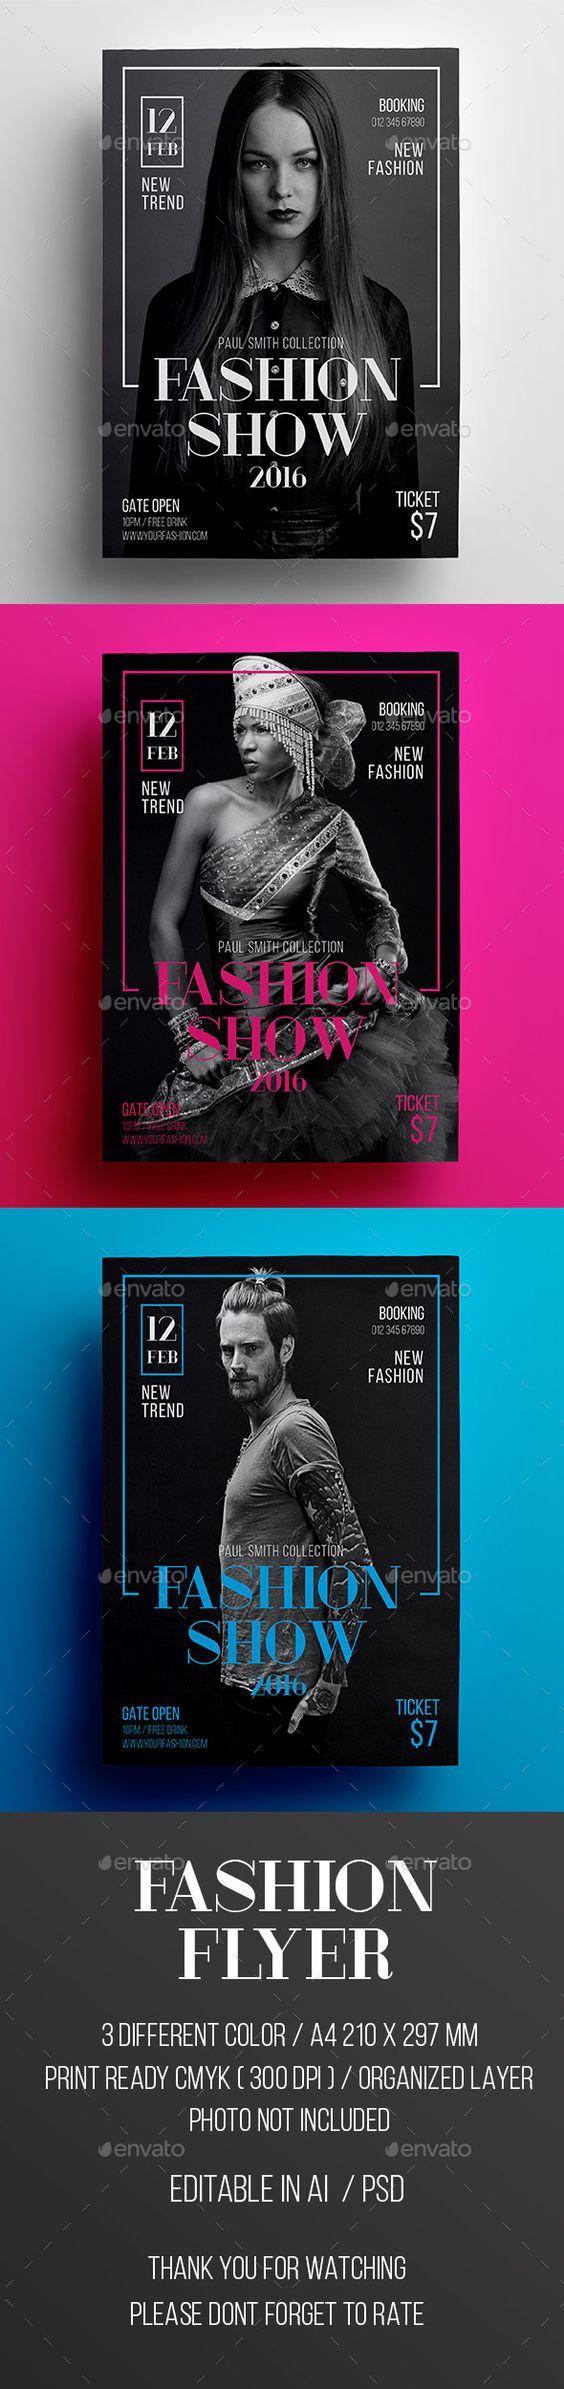 Fashion Show Flyer Template PSD, Vector AI #design Download: http://graphicriver.net/item/fashion-show-flyer/14221823?ref=ksioks: